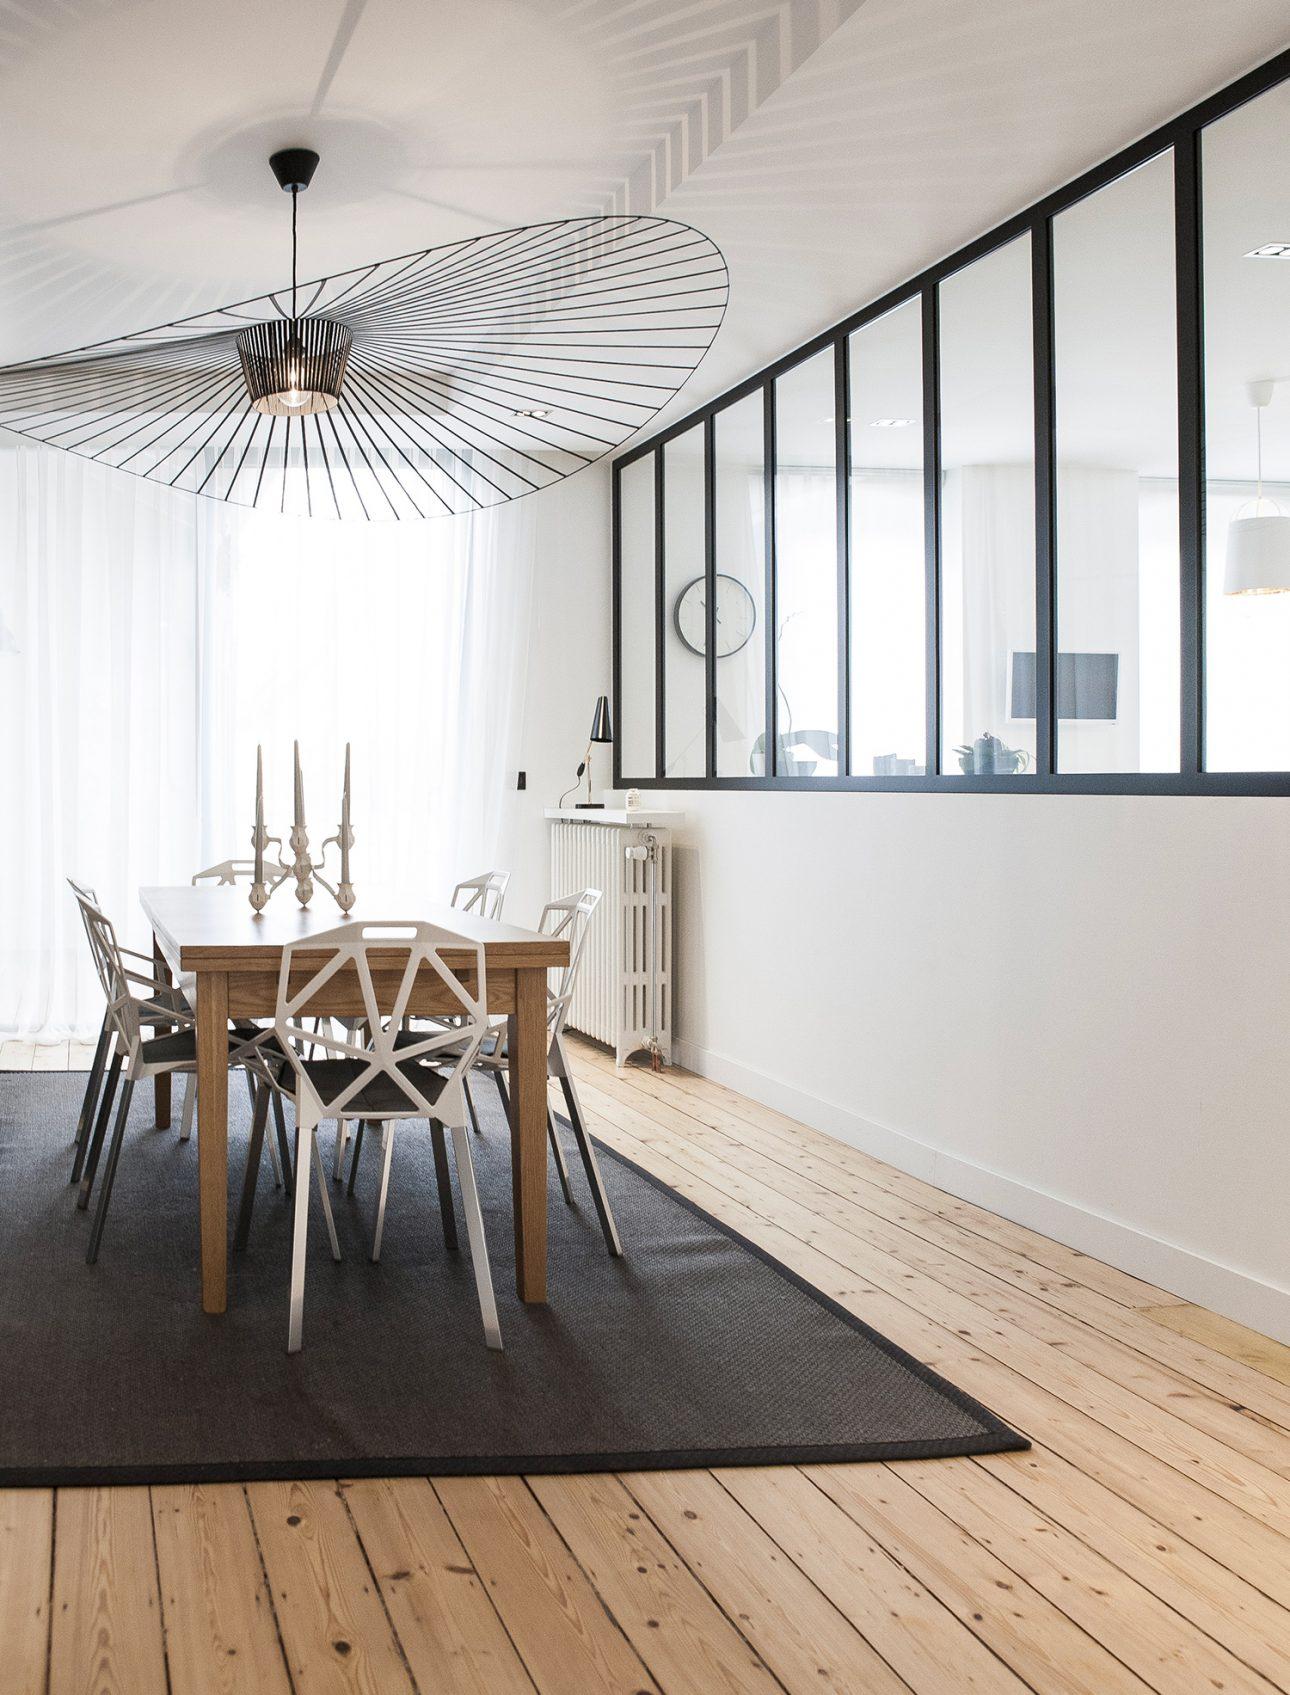 photographie architecture d 39 int rieur strasbourg gilles peter. Black Bedroom Furniture Sets. Home Design Ideas